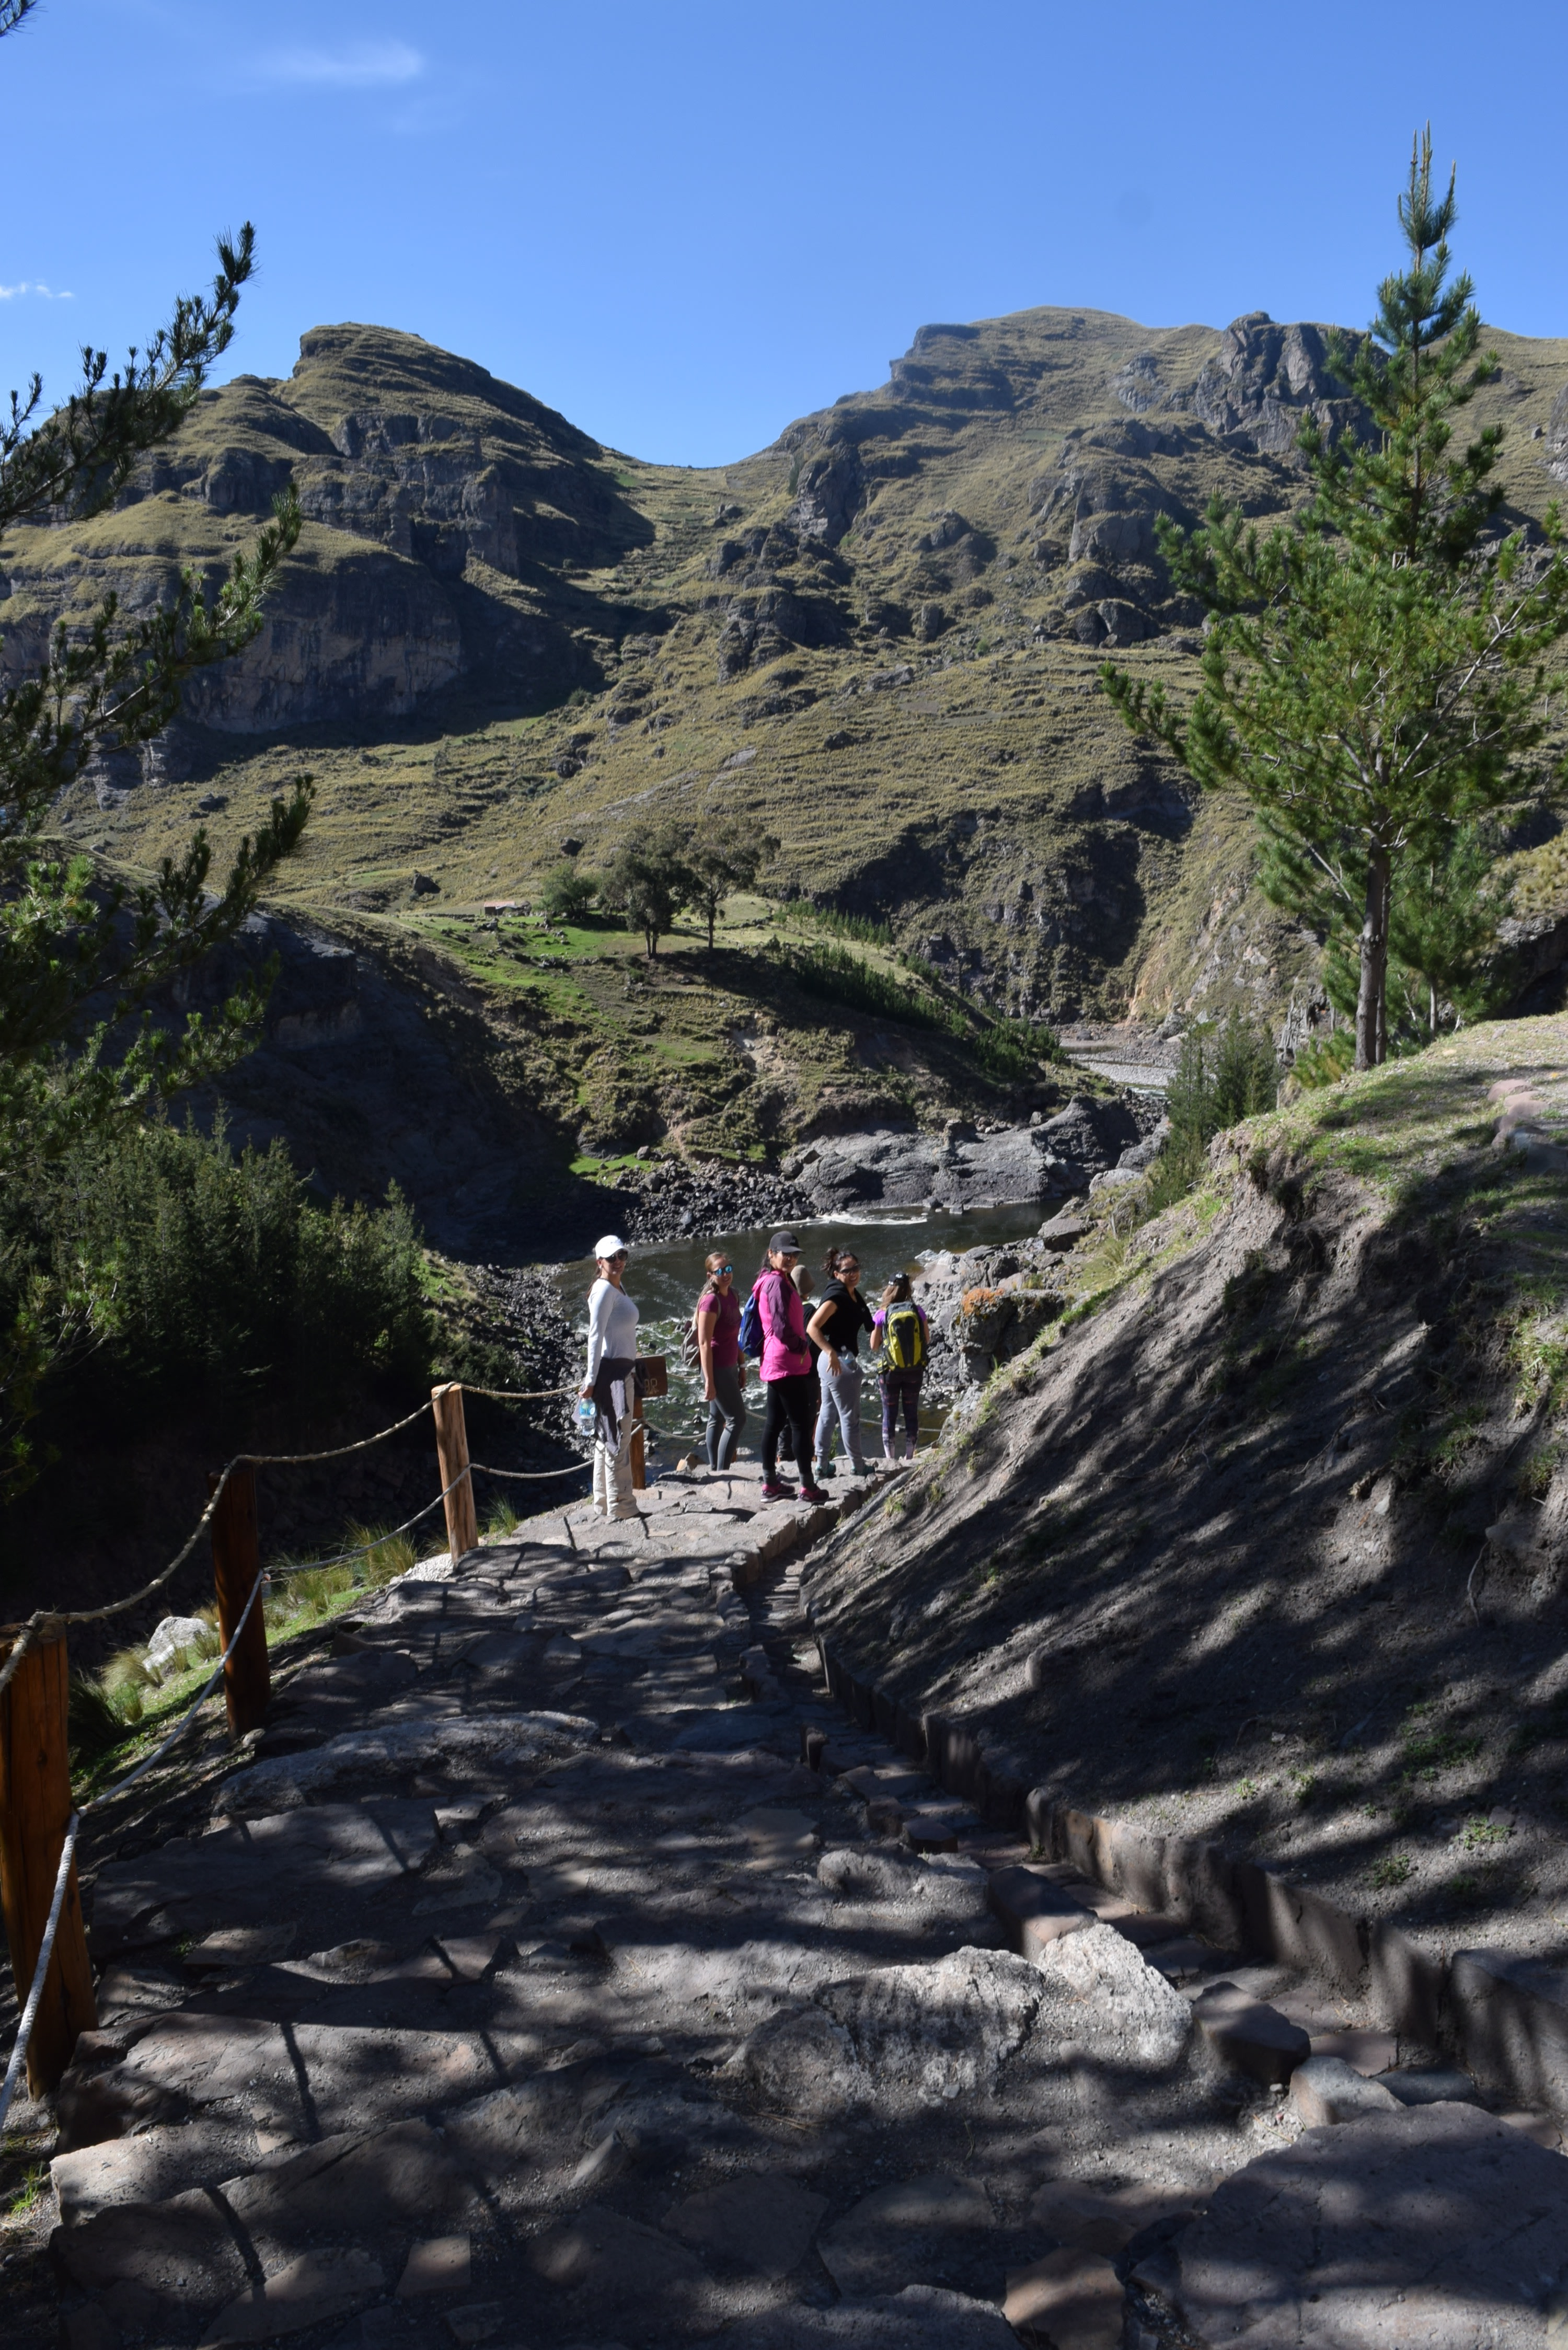 Cross the adventurous Inca Brigde in Peru